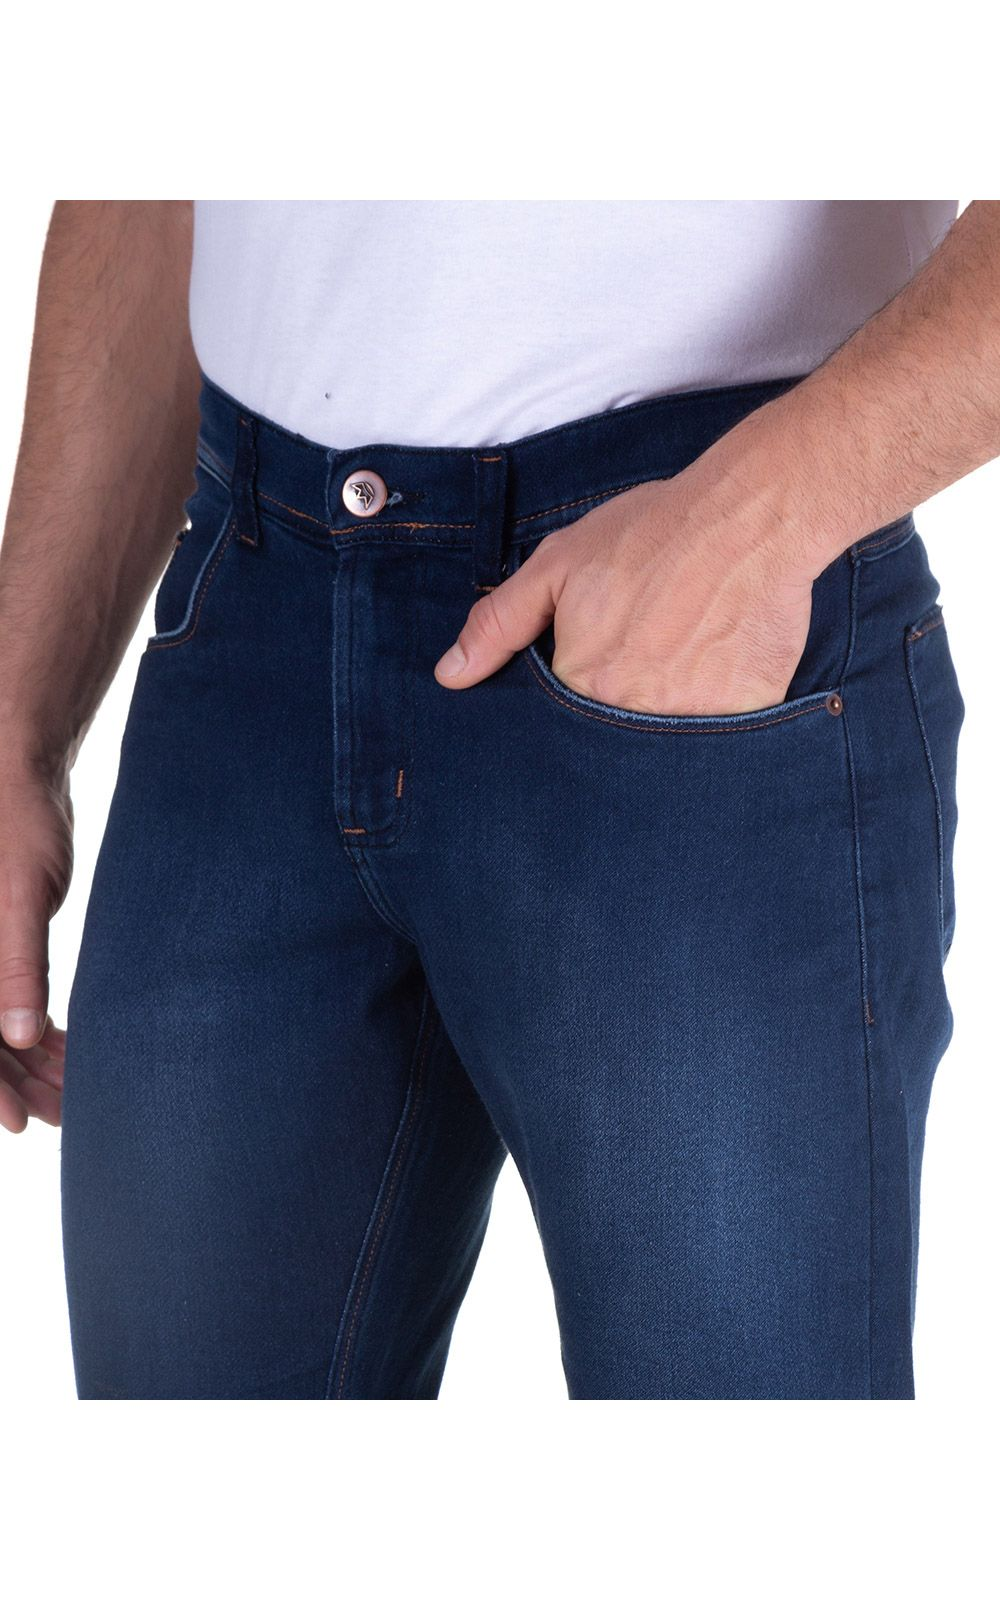 Foto 3 - Calça Jeans Masculina Azul Lisa